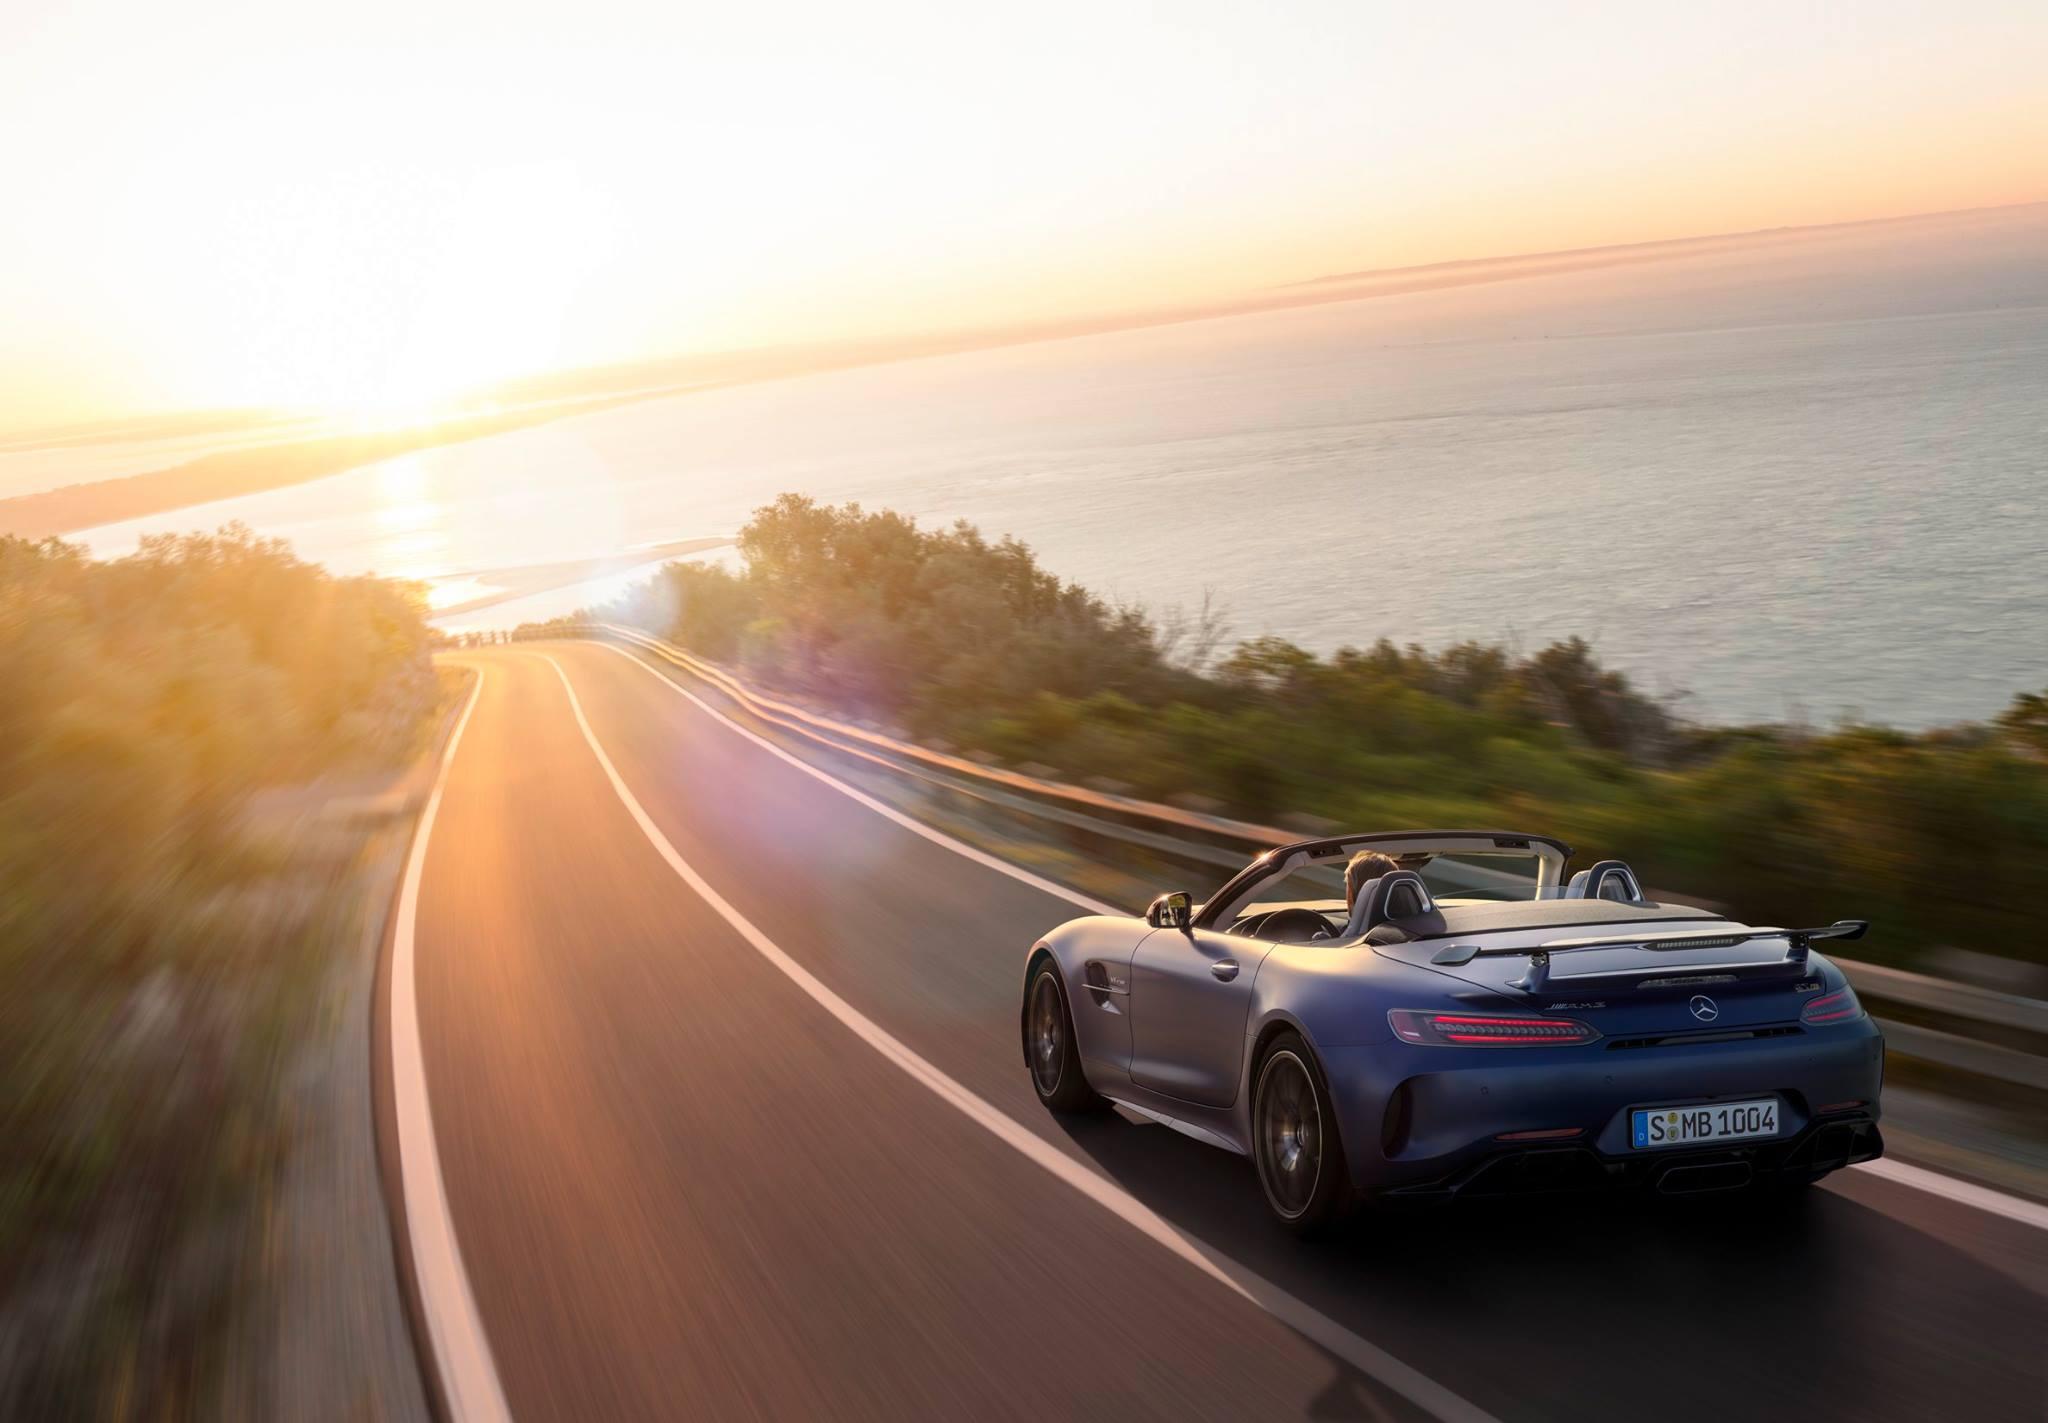 Mercedes-AMG-GTR-Roadster_acsptours2